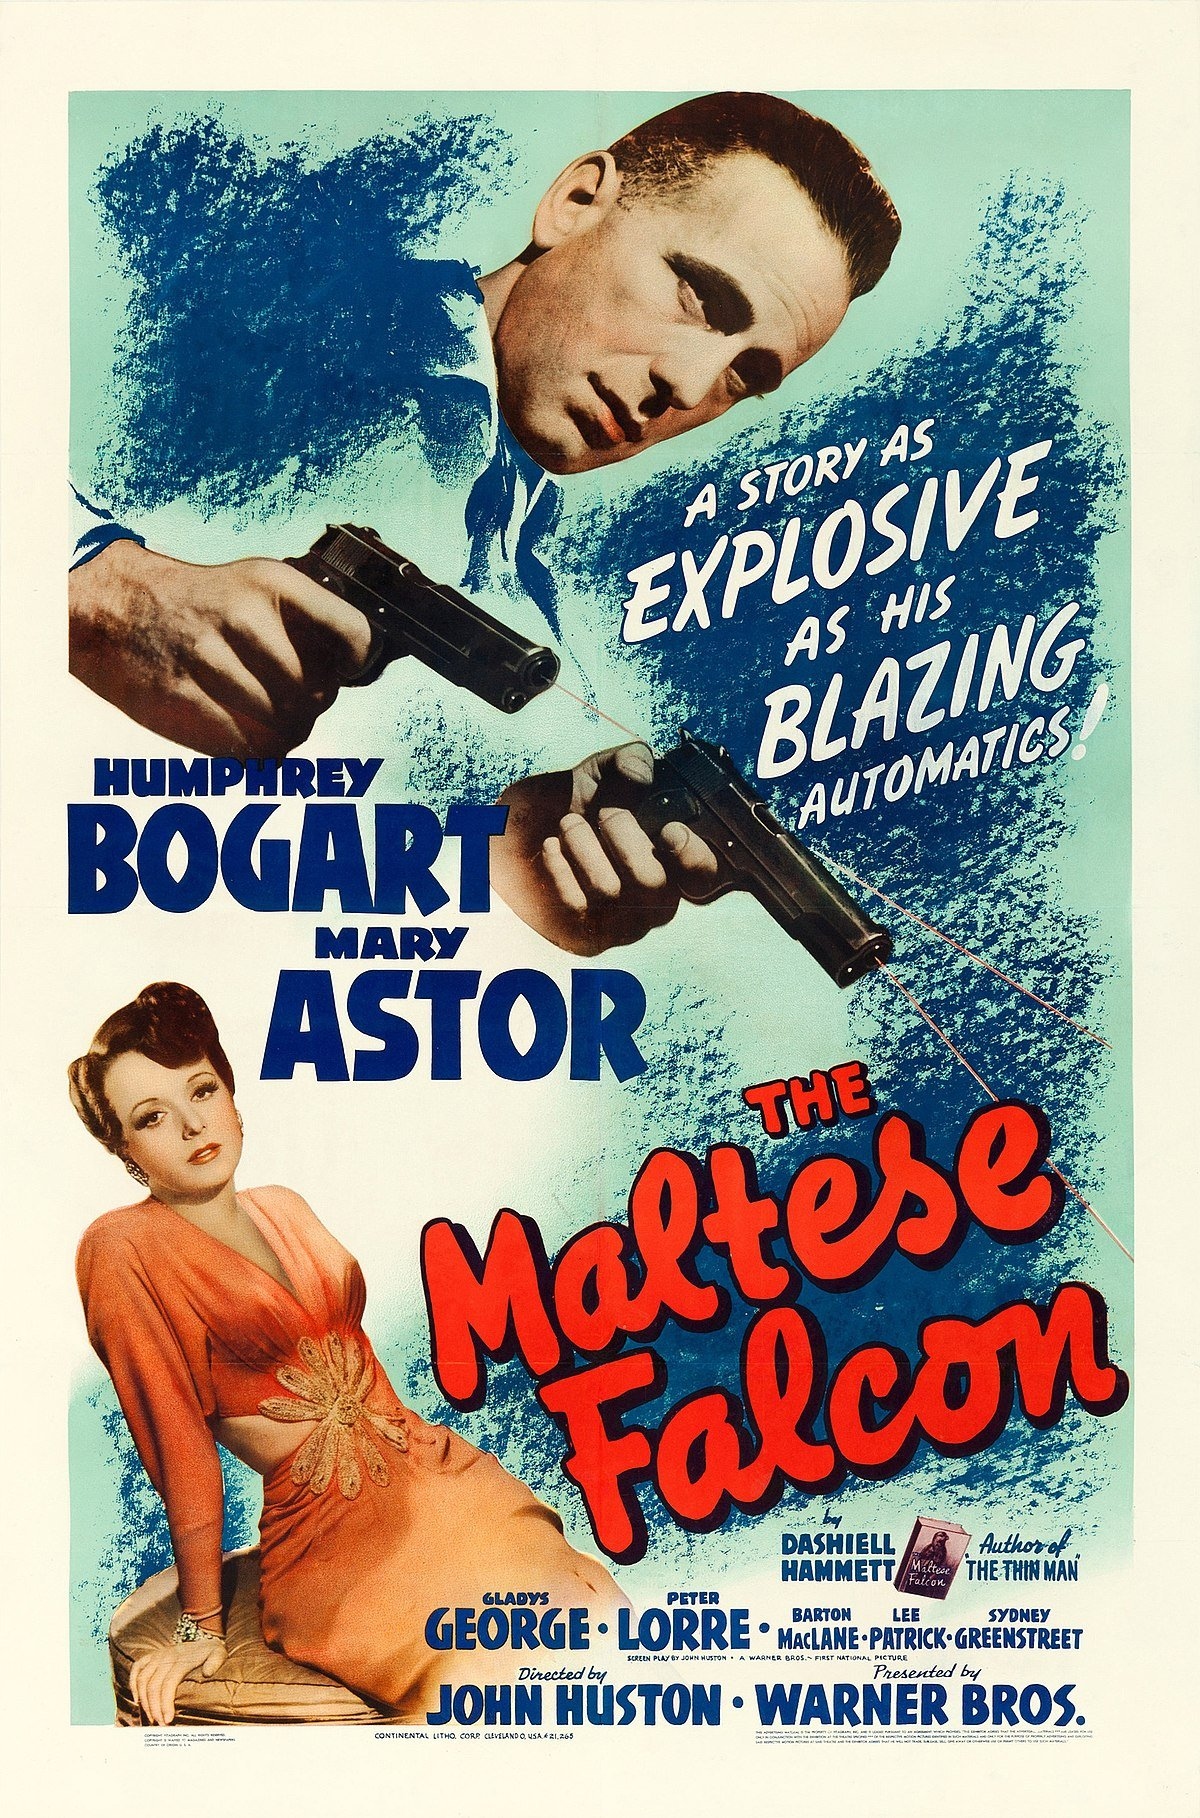 The Matese Falcon Premieres